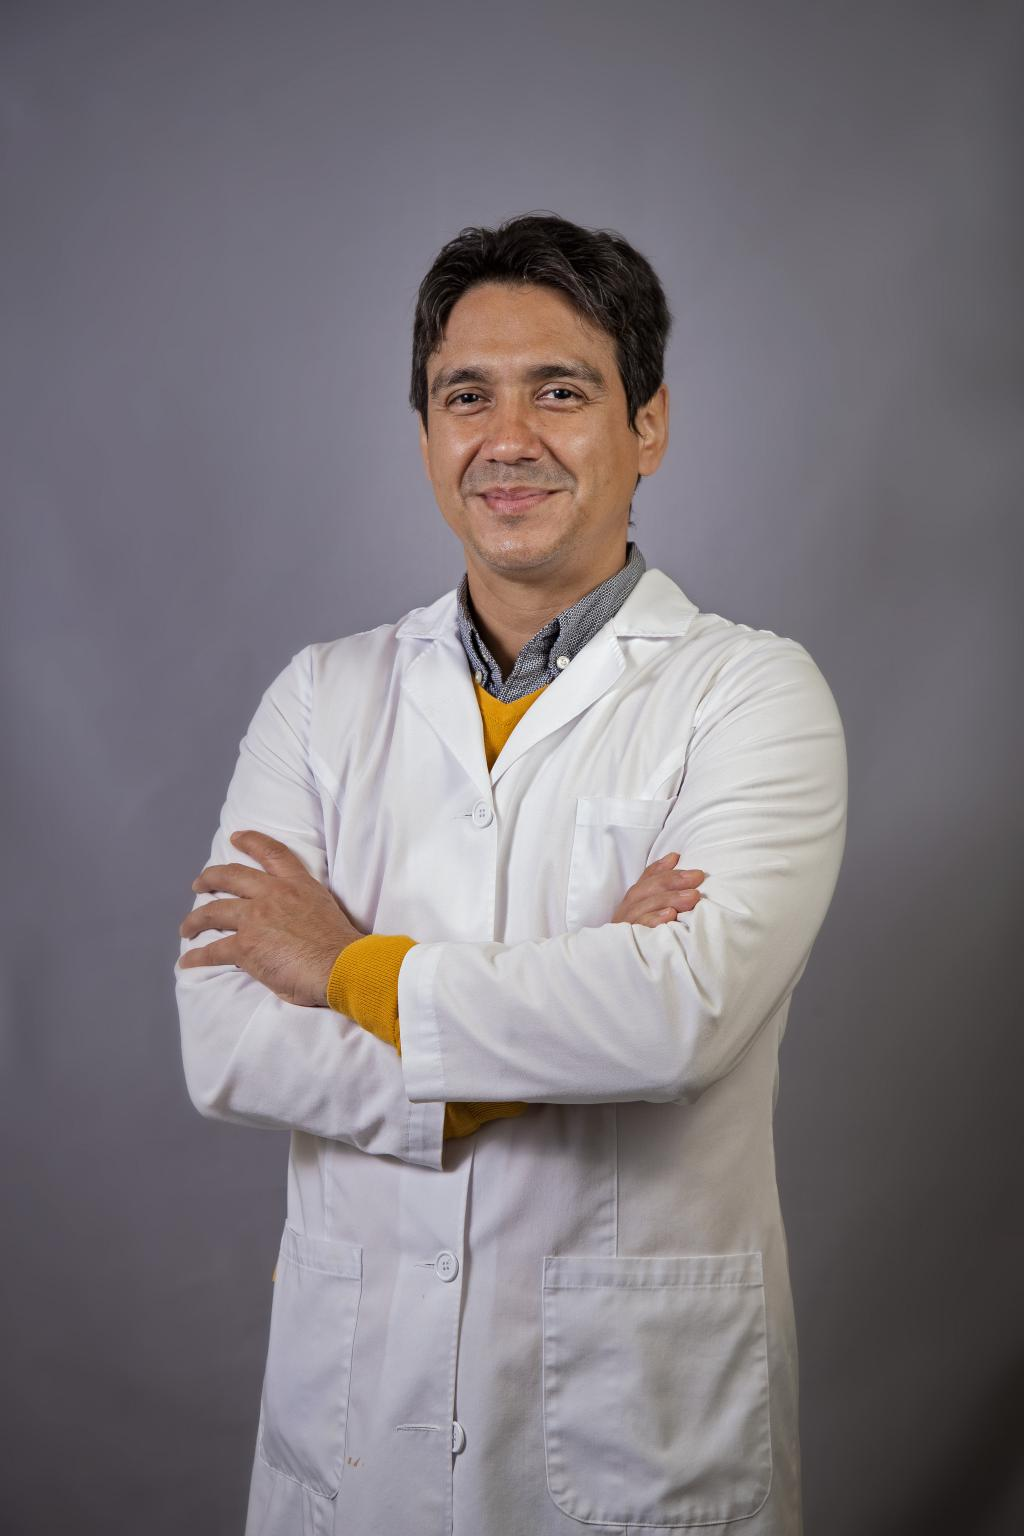 Cesar Casanova Gonzales